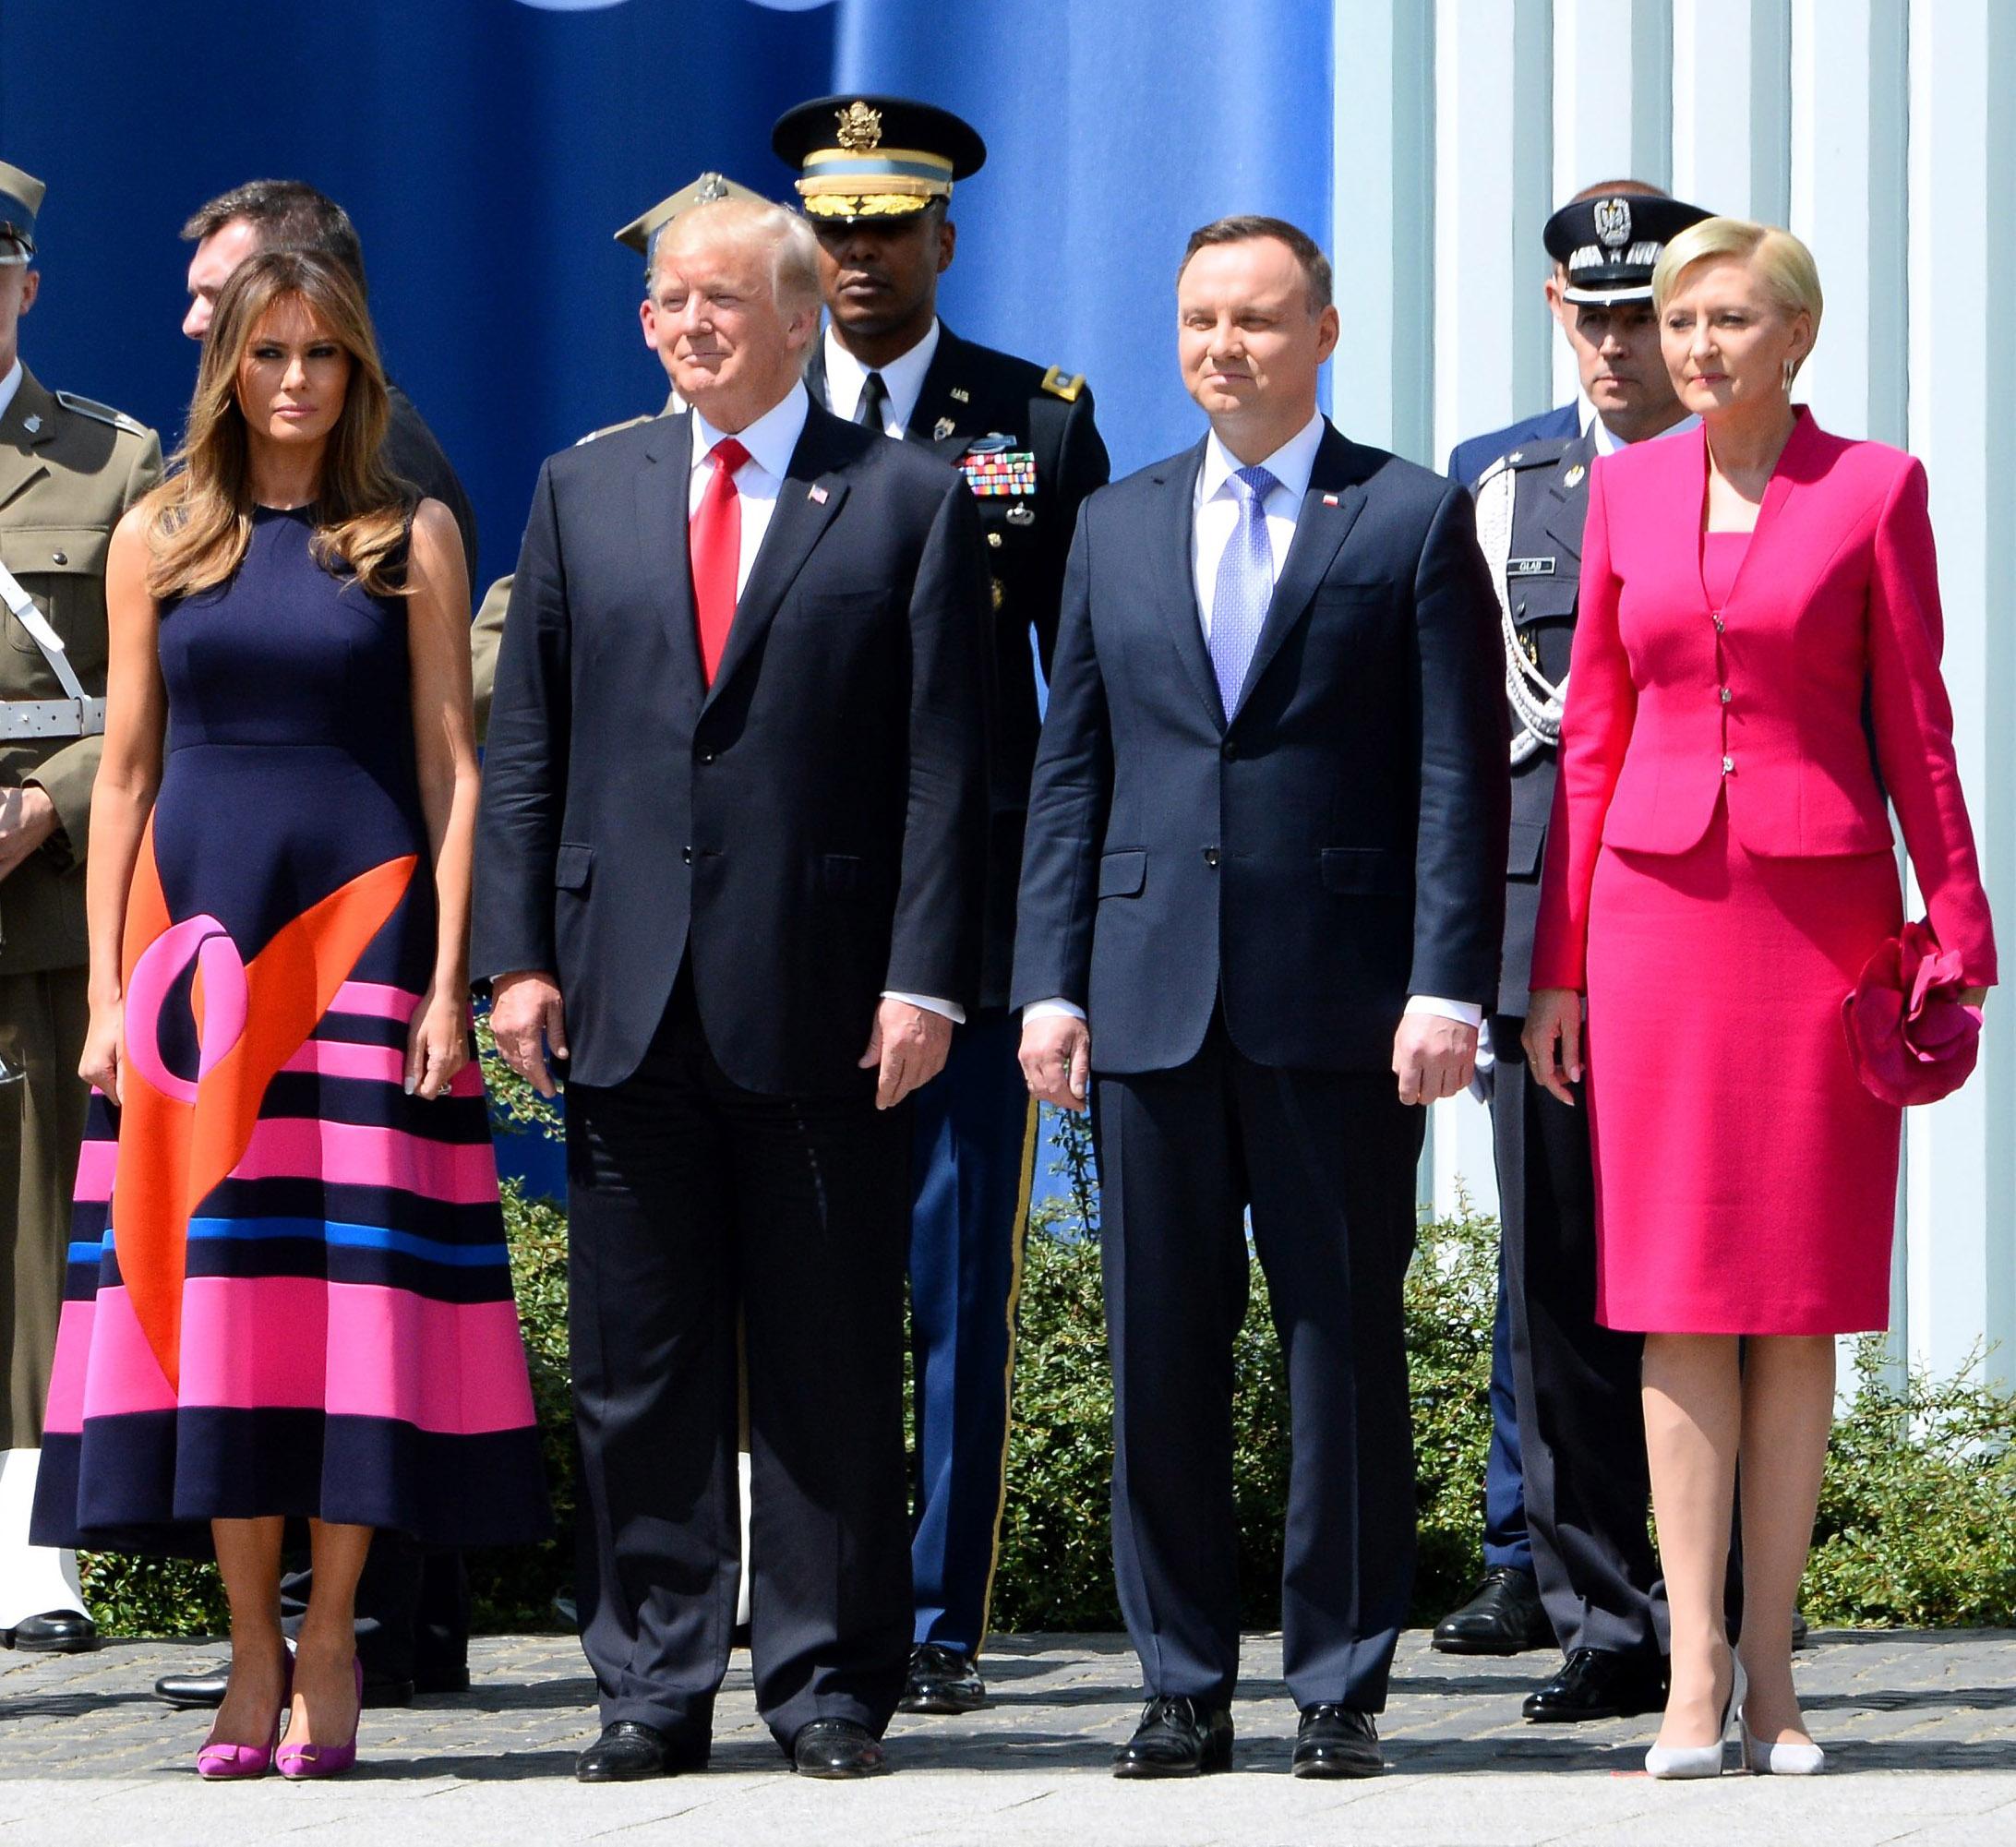 Melania Trump, Donald Trump, Andrzej Duda y Agata Agata Kornhauser-Duda